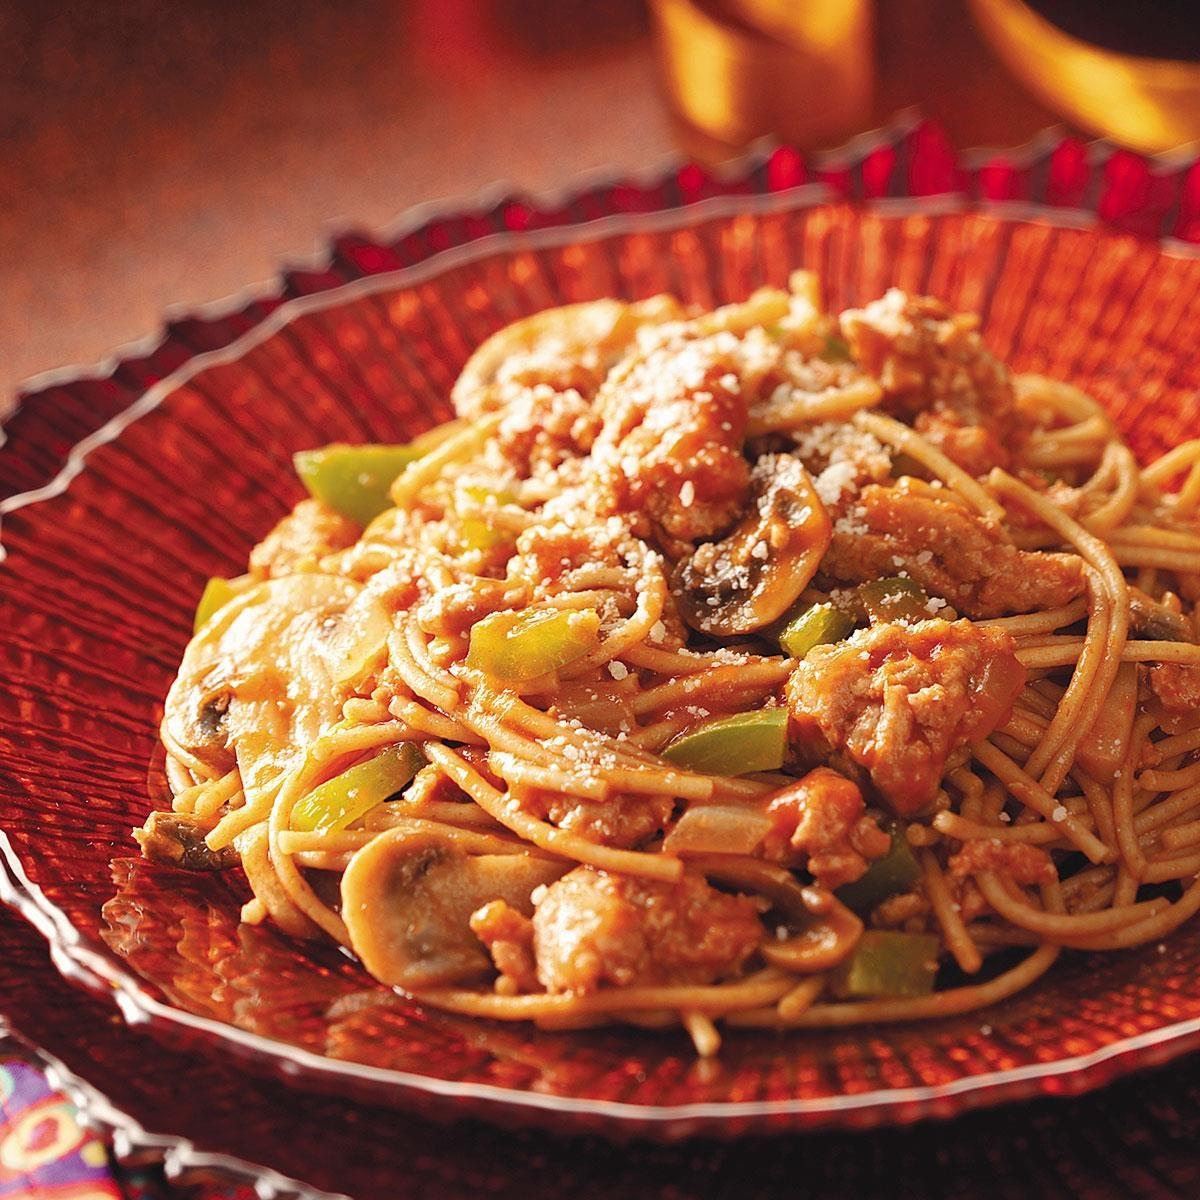 Jiffy Ground Pork Skillet Recipe: Gluten-Free Quick Turkey Spaghetti Recipe